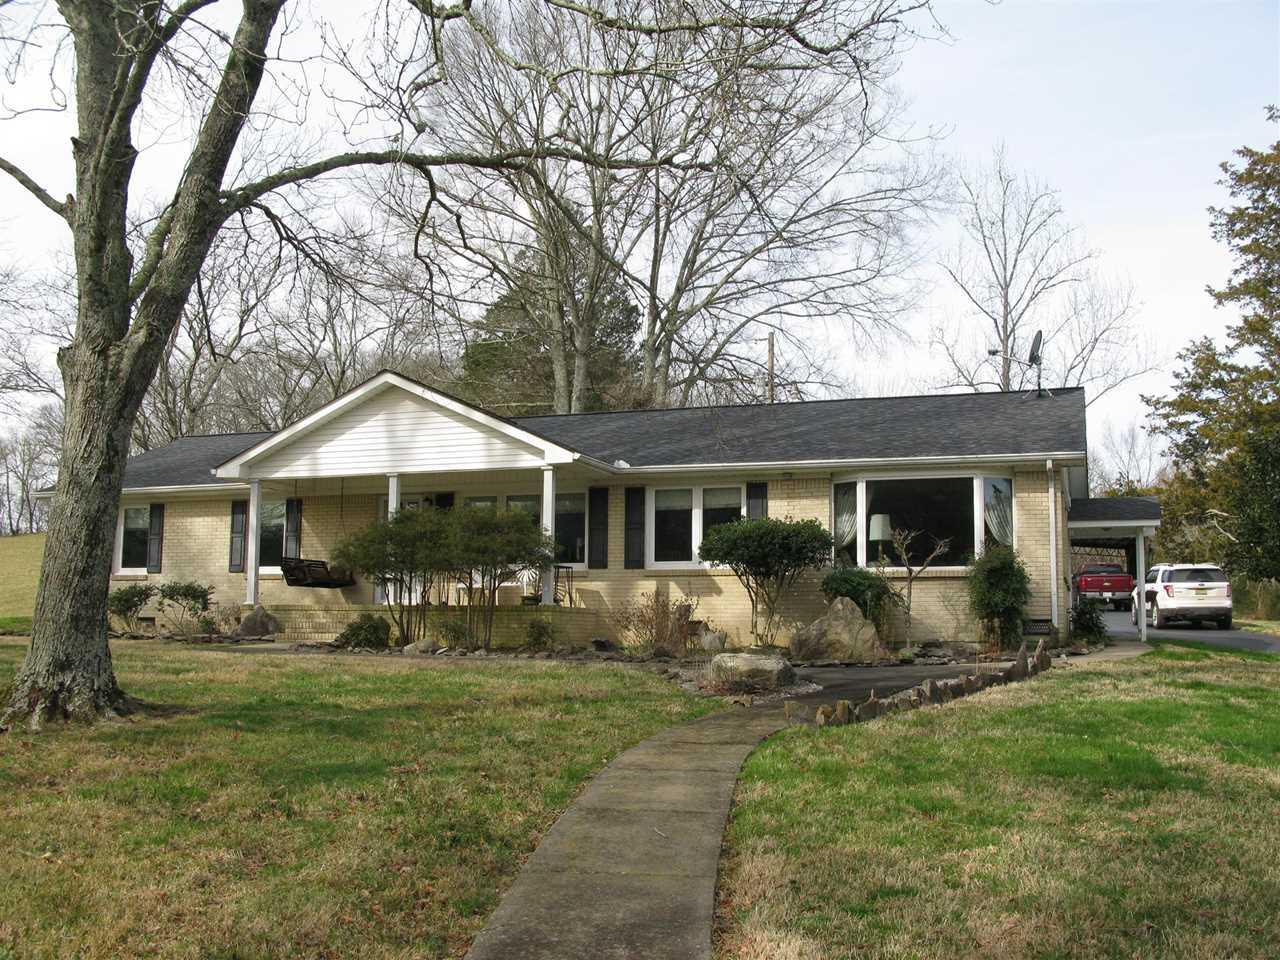 854 Shelbyville Hwy Fayetteville, TN 37334 | MLS 2010683 Photo 1